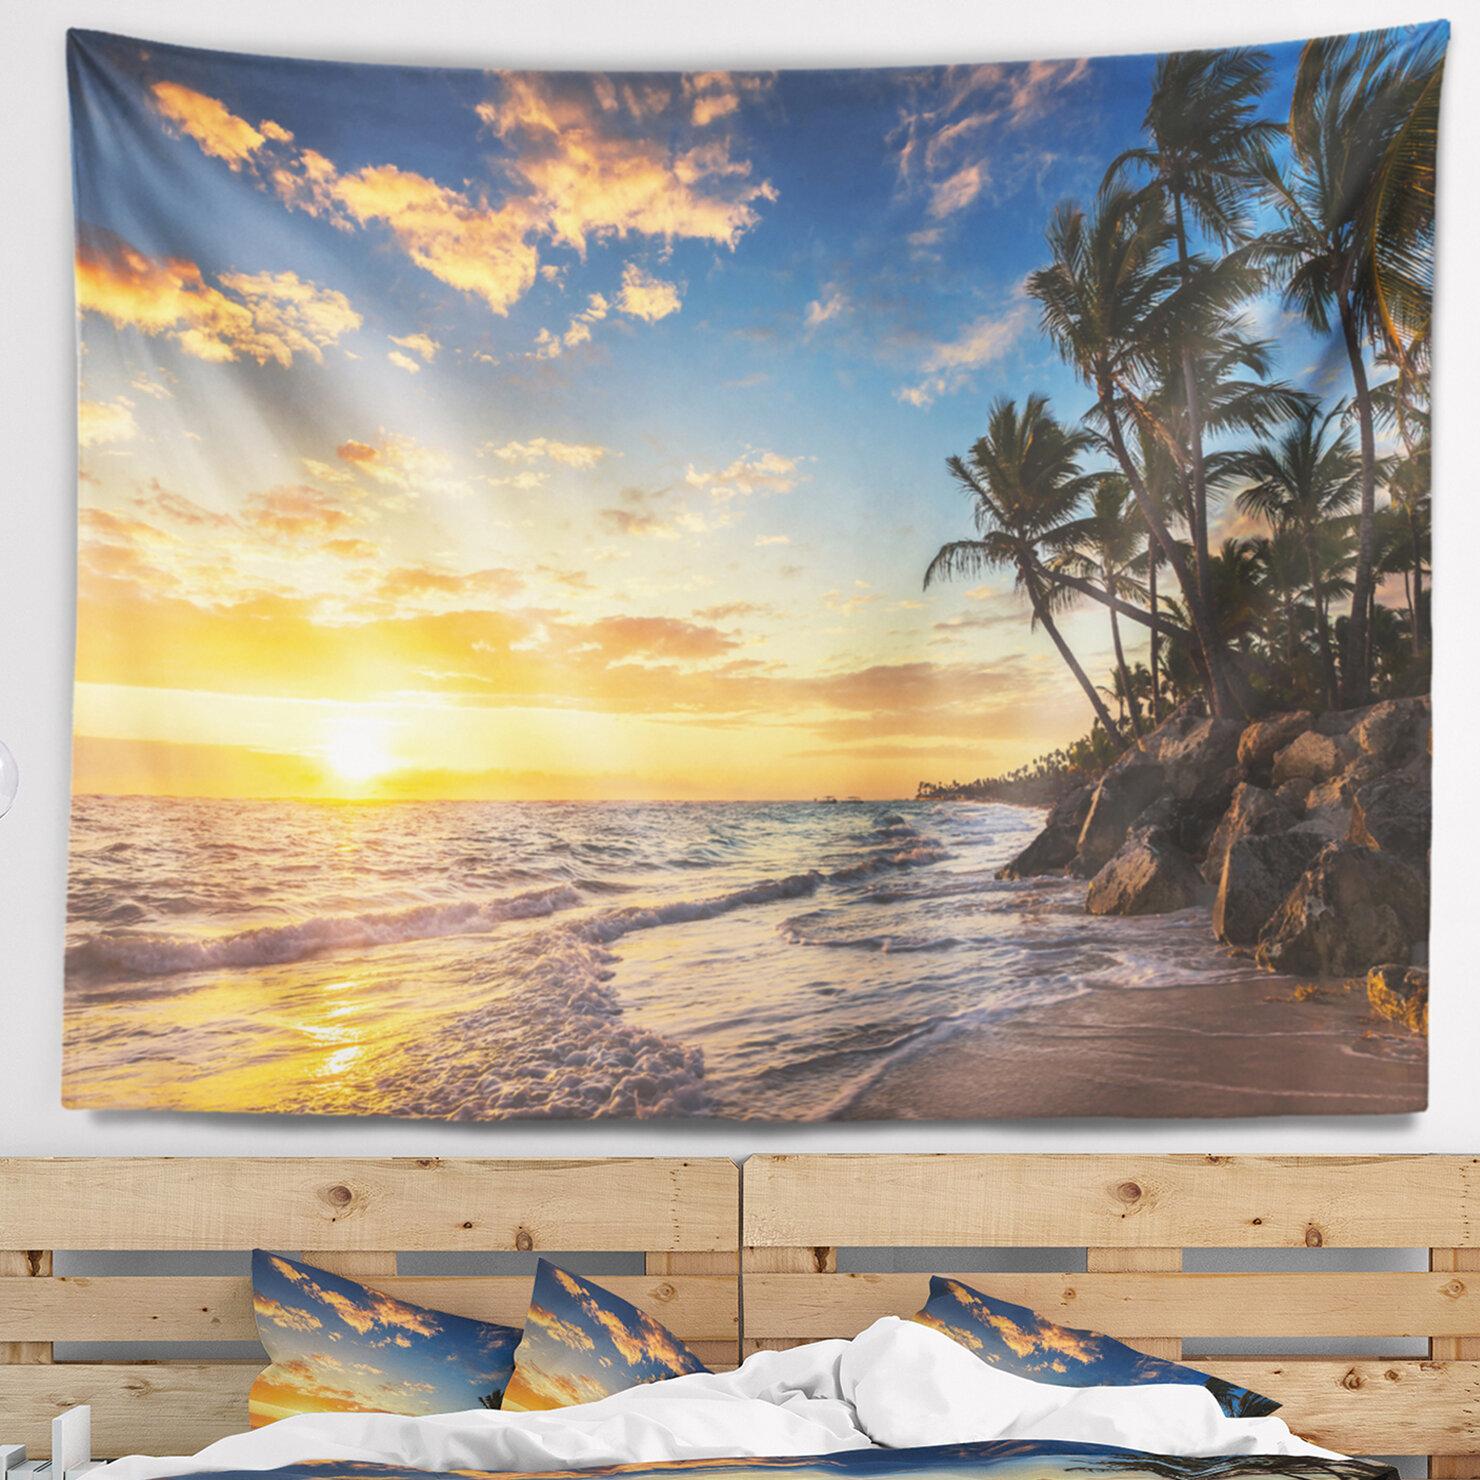 Tropical Island Paradise: East Urban Home Seascape Paradise Tropical Island Beach